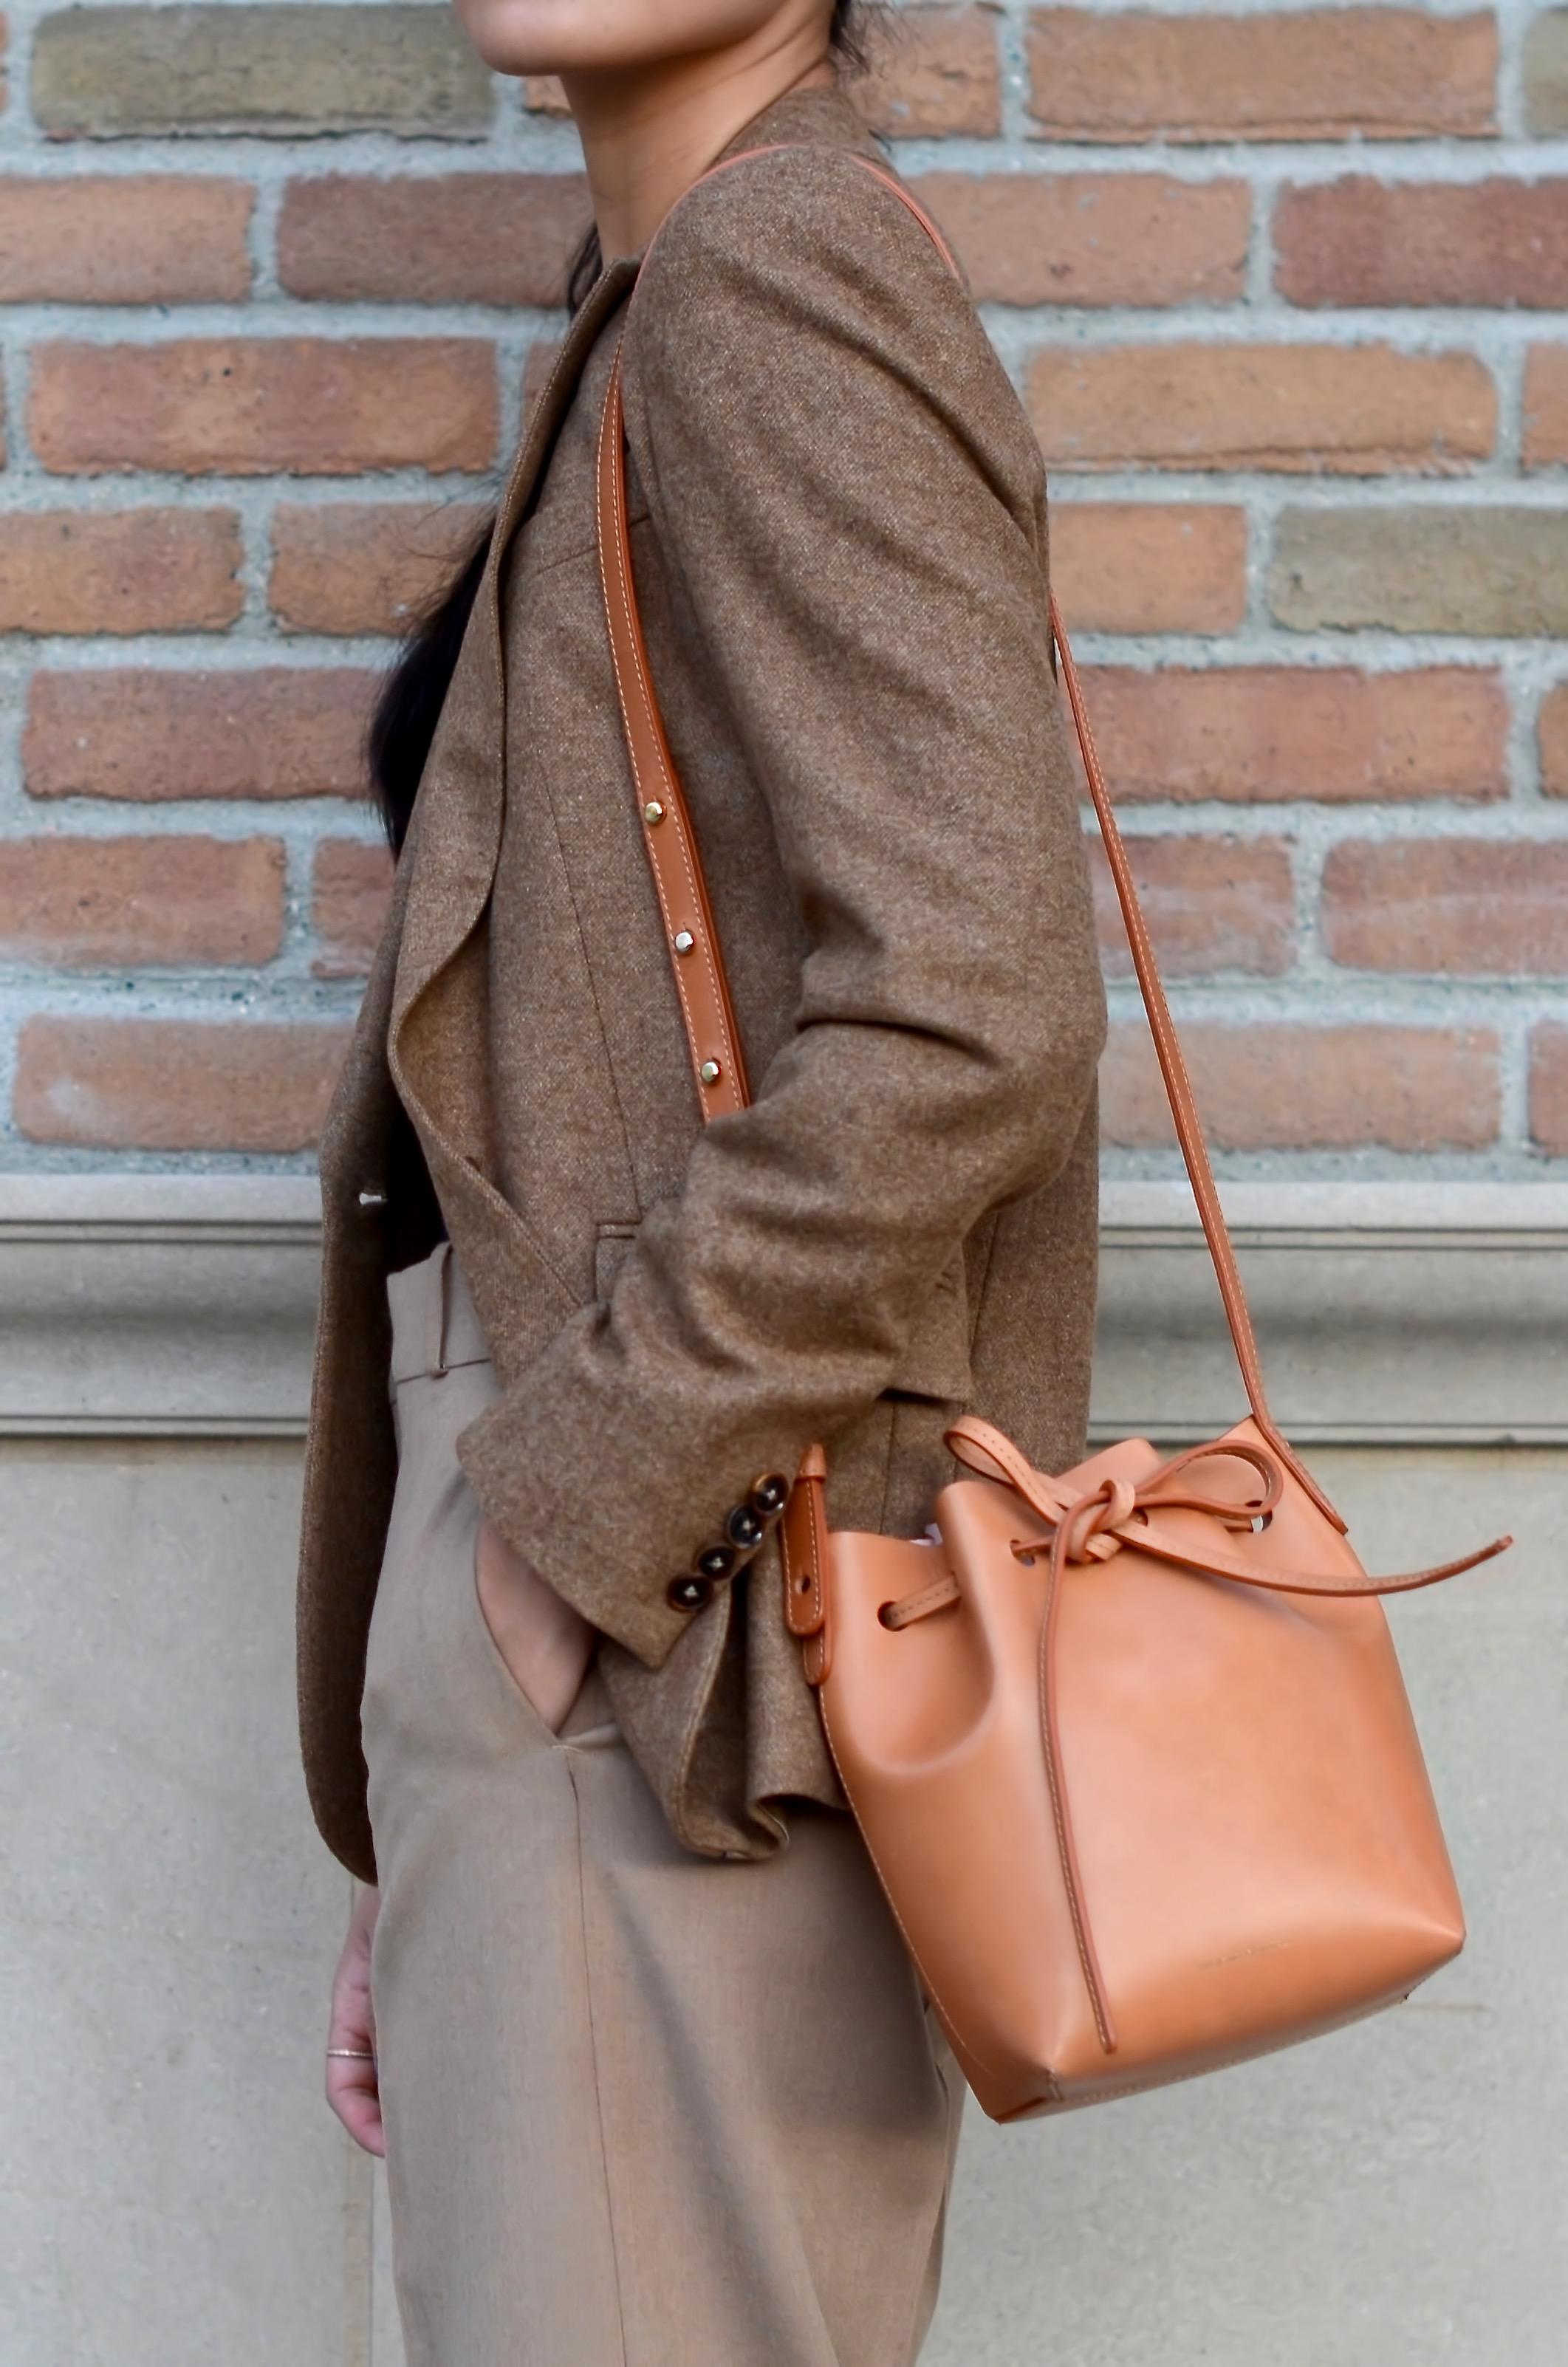 Just Goh With It-Outfit-shopstyle-dressforsuccess-zara-camel-wide-leg-pants-massimo-dutti-blazer-mansur-gavriel-mini-bucket-bag-6.jpg